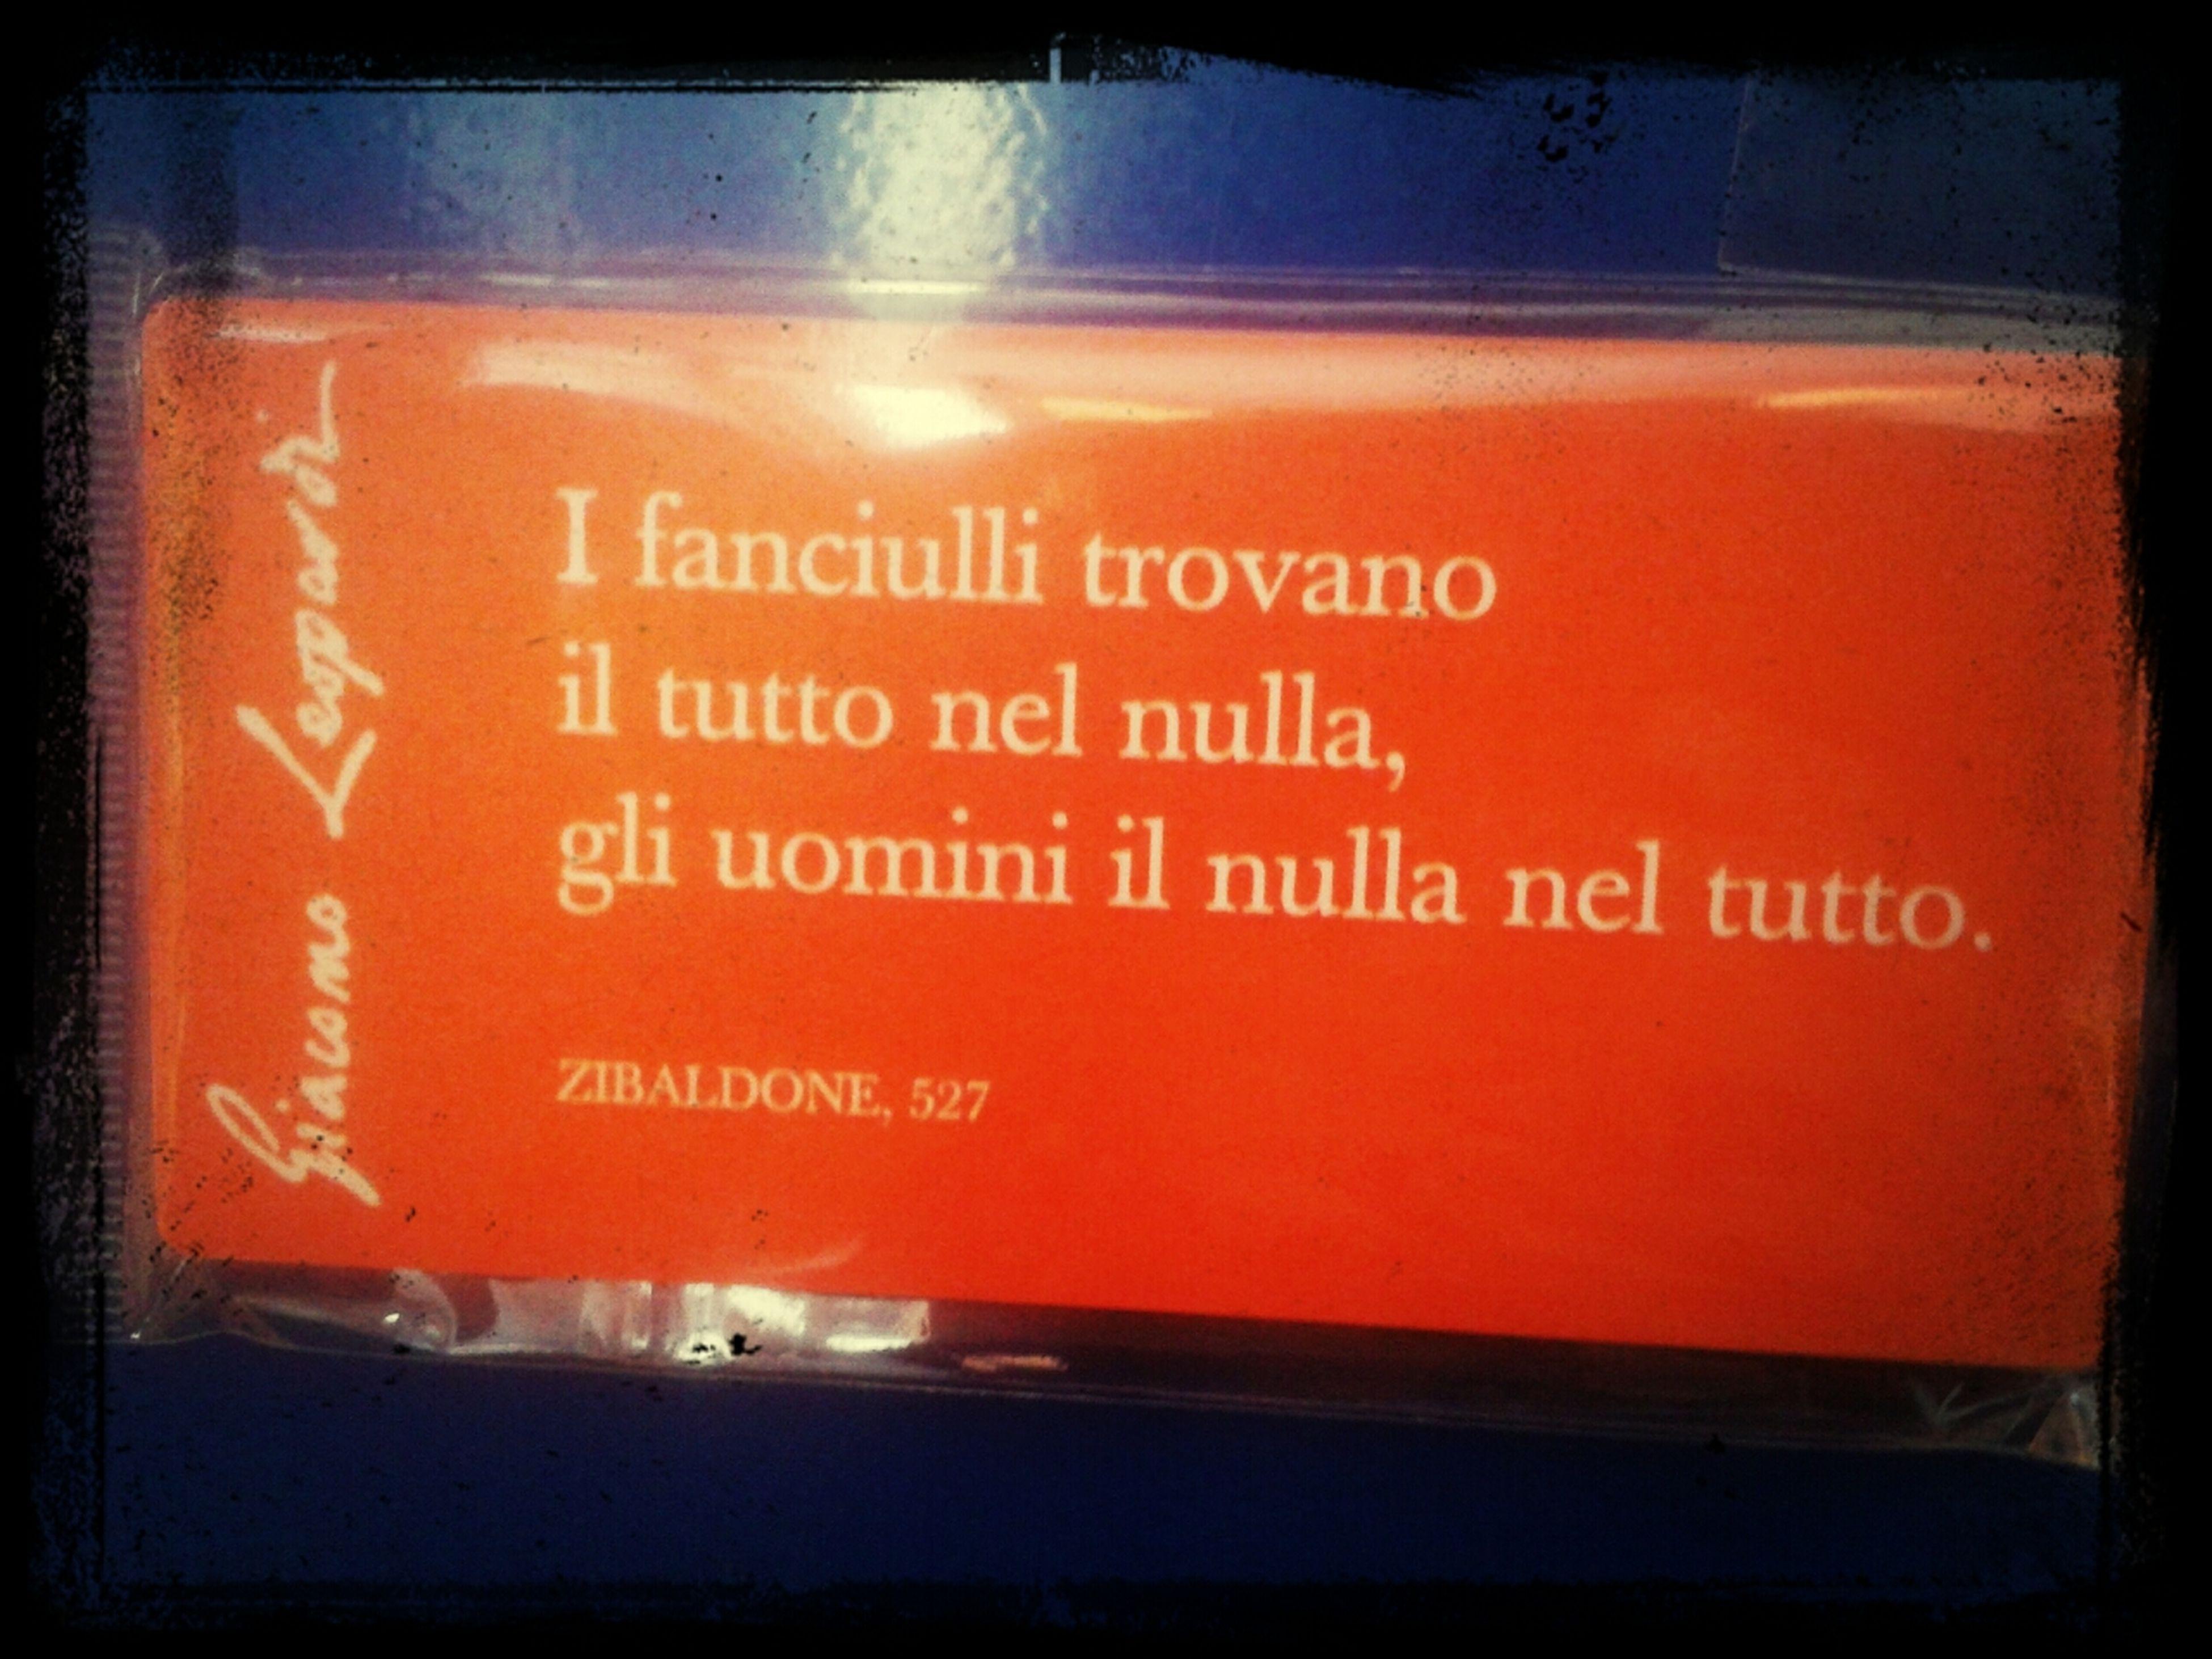 Very Famous Quote Italian Writer Leopardi Giacomo Zibaldone